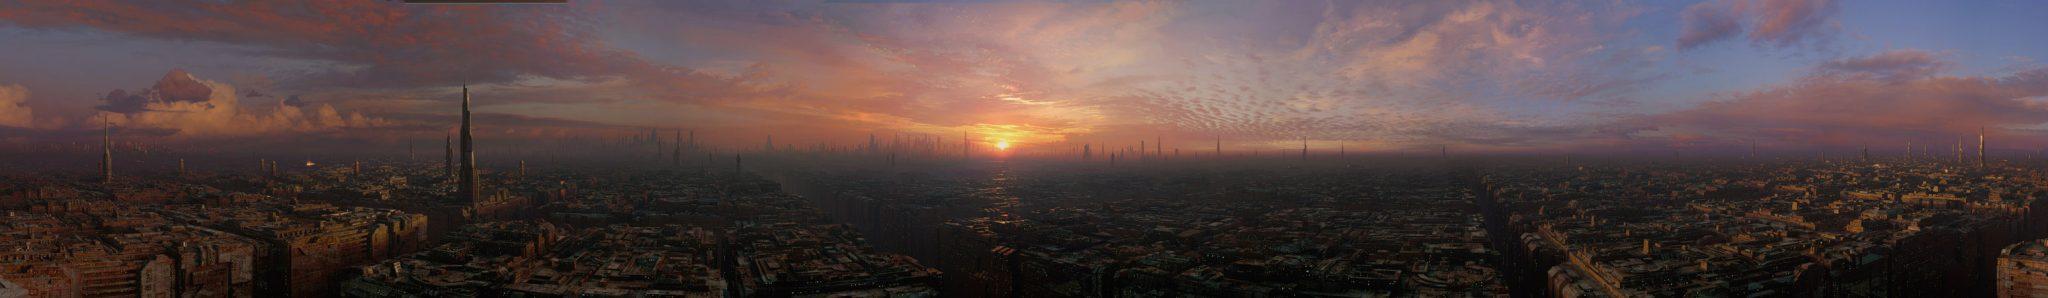 digital-painting-dusso-panorama-city